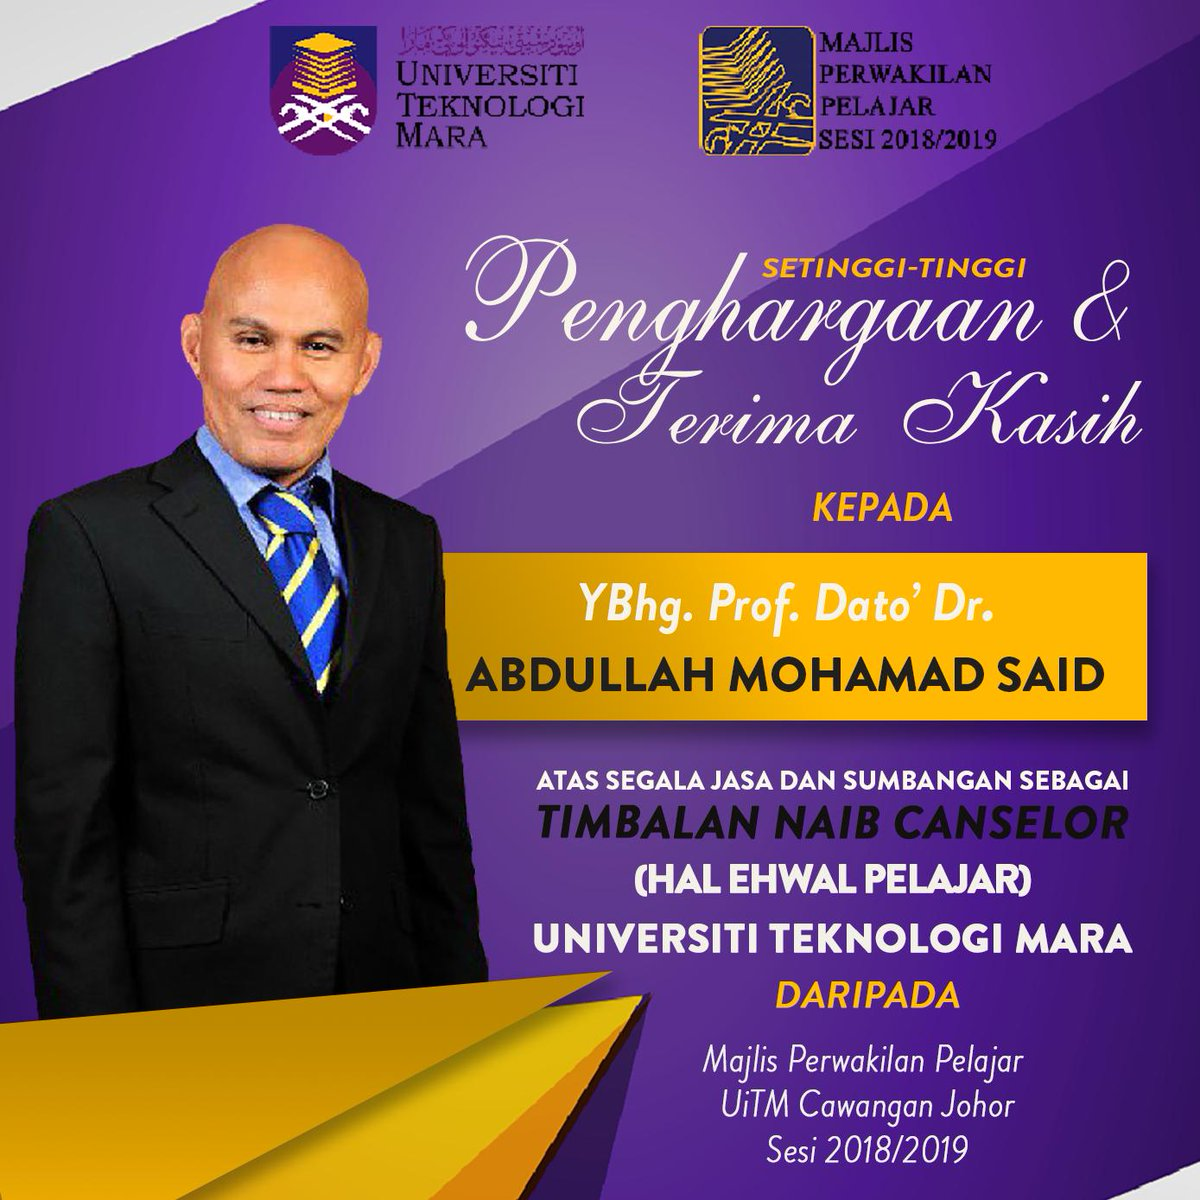 Mpp Uitm Pasir Gudang On Twitter Assalamualaikum Seluruh Warga Uitm Cawangan Johor Ingin Mengucapkan Setinggi Tinggi Penghargaan Dan Jutaan Terima Kasih Kepada Ybhg Prof Dato Dr Abdullah Mohamad Said Di Atas Jasa Dan